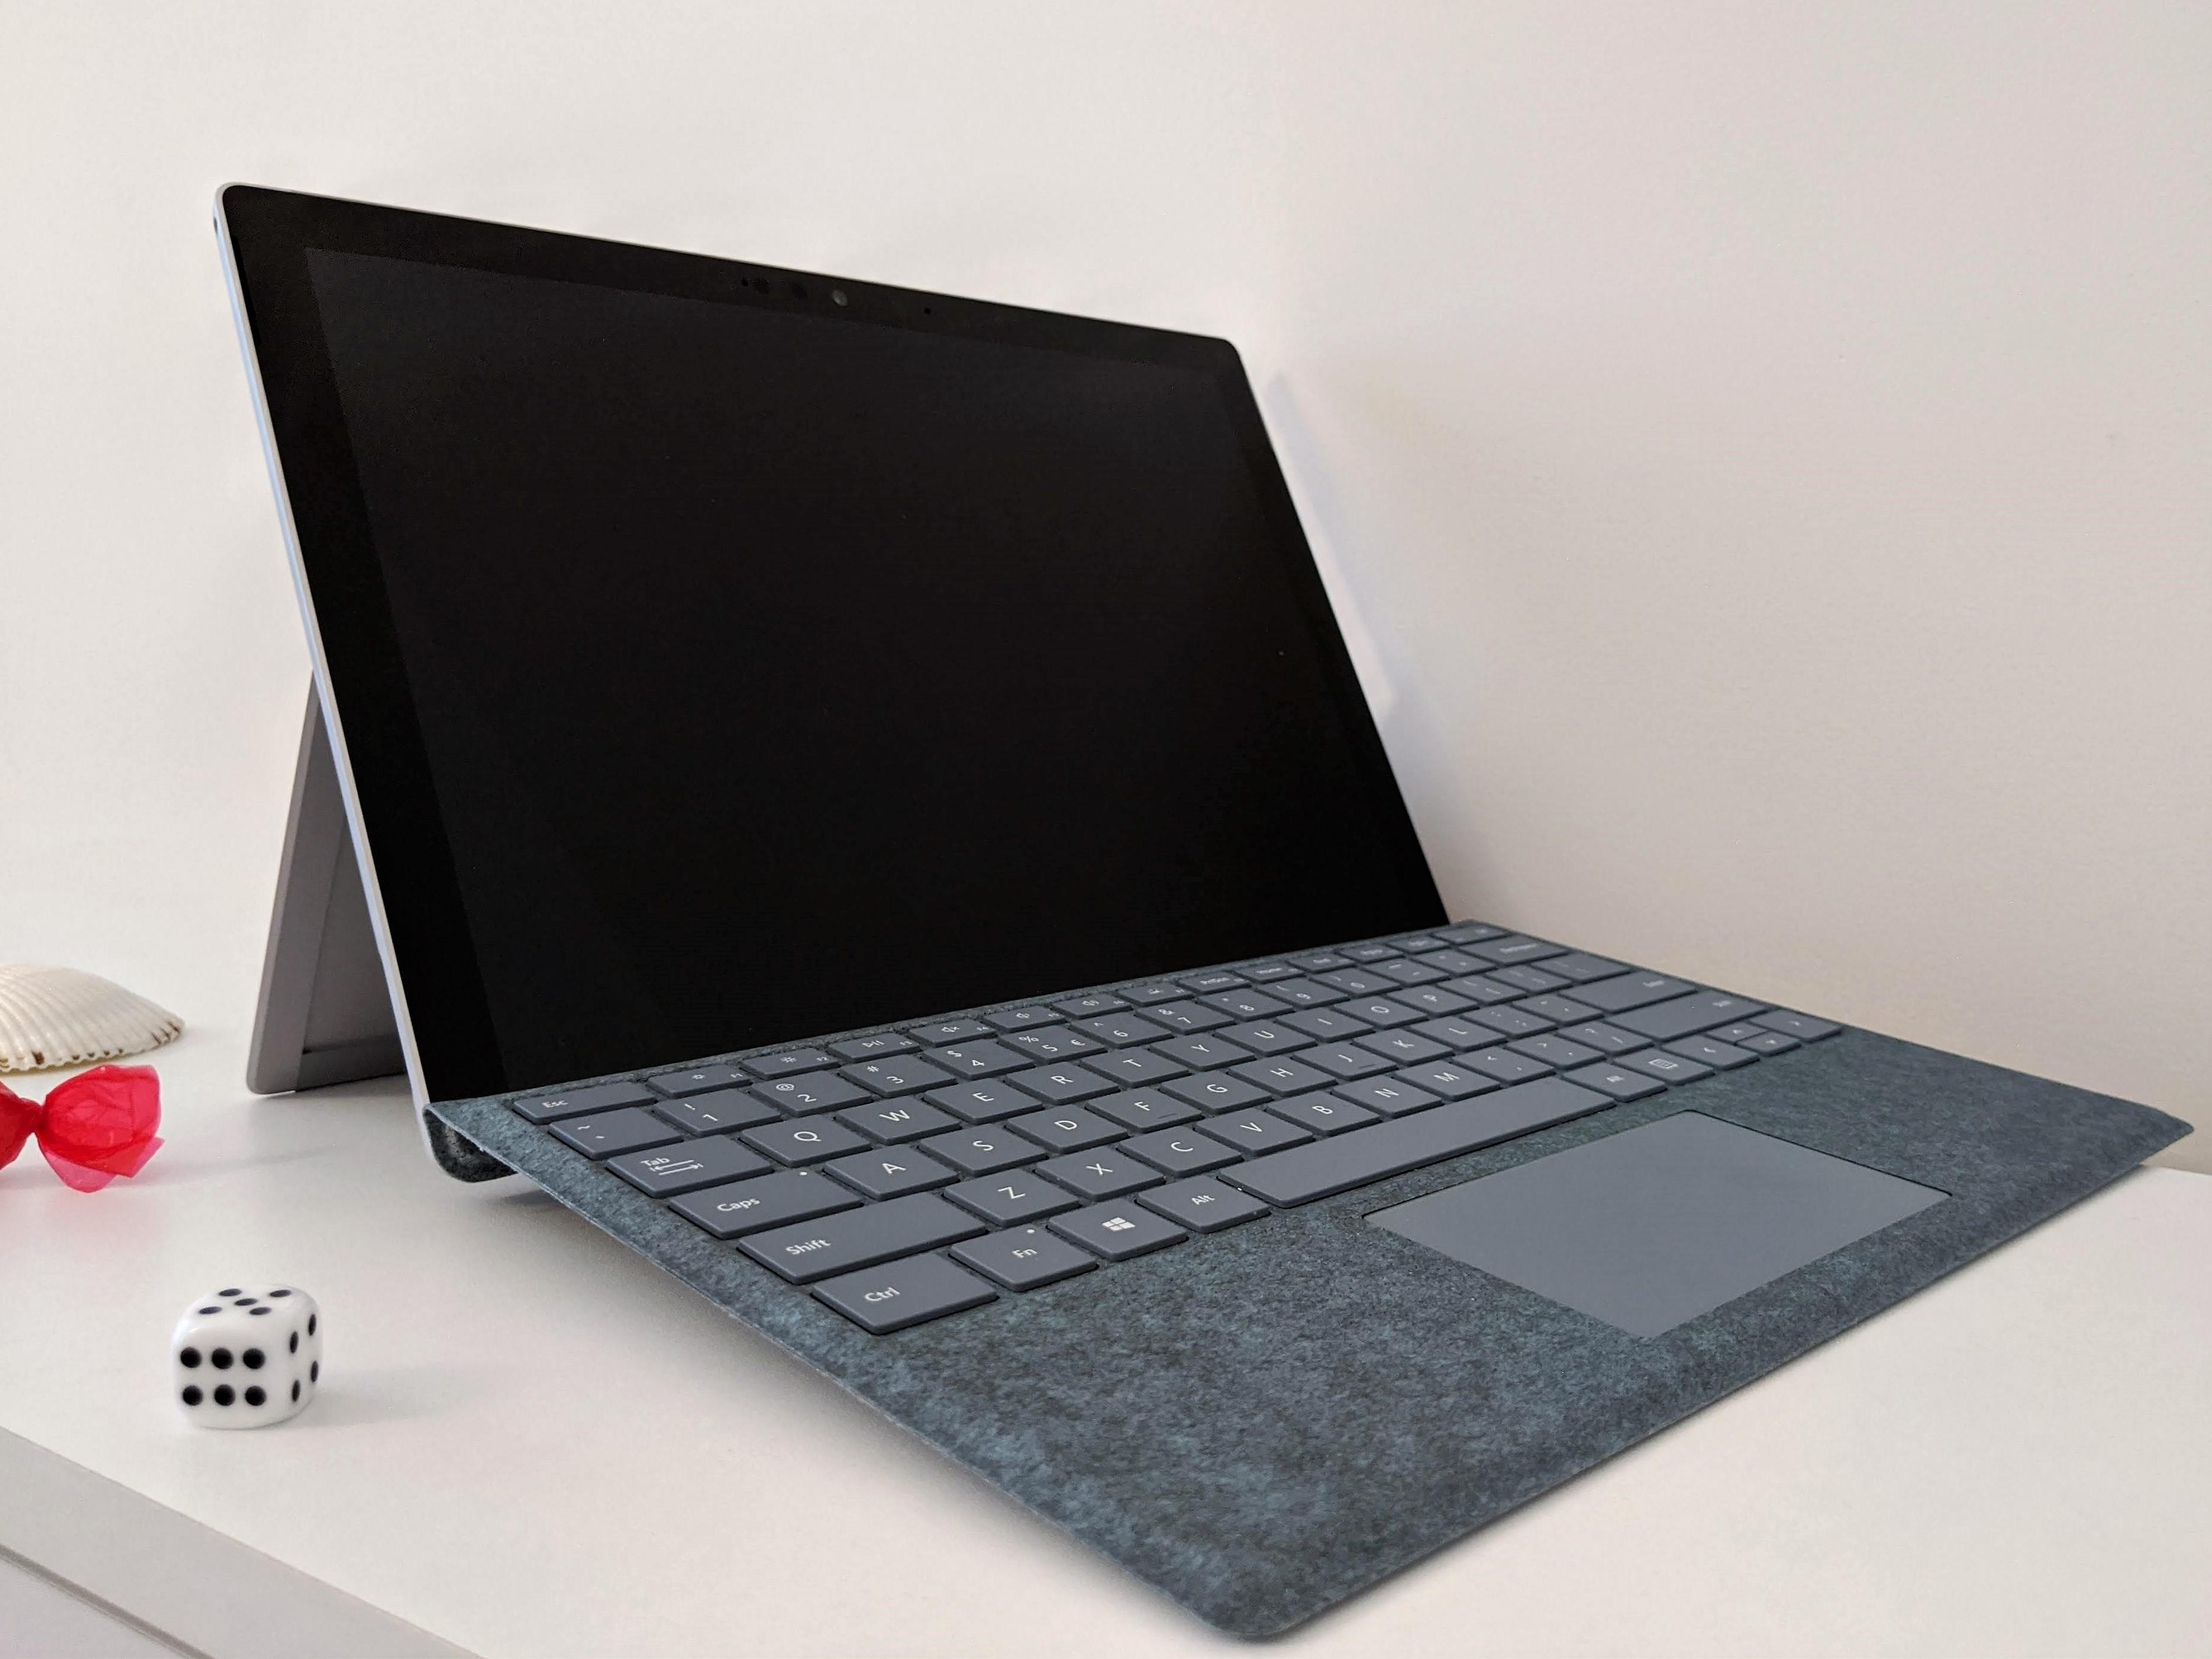 Microsoft Surface Go 2 z procesorami Amber Lake? 16